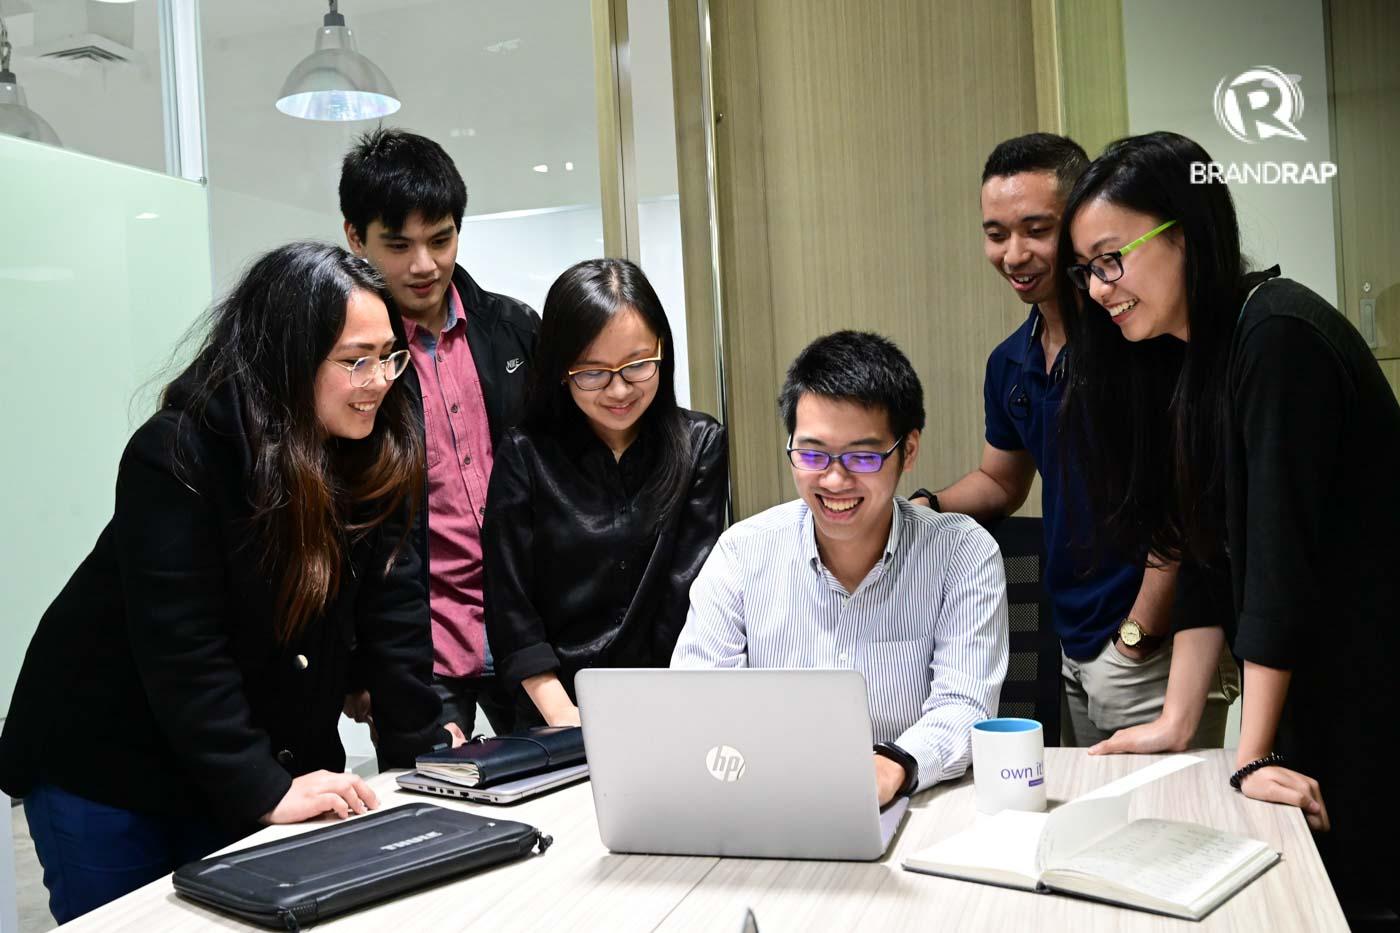 THE COBENA TEAM. (L-R) Senior Digital and Research Executive Mari Arambulo, Anton Yamzon, Leean Tria, Bryan Tiu, Senior Data Analyst Ben Harder, and Product Manager for Gateway Leona Lao